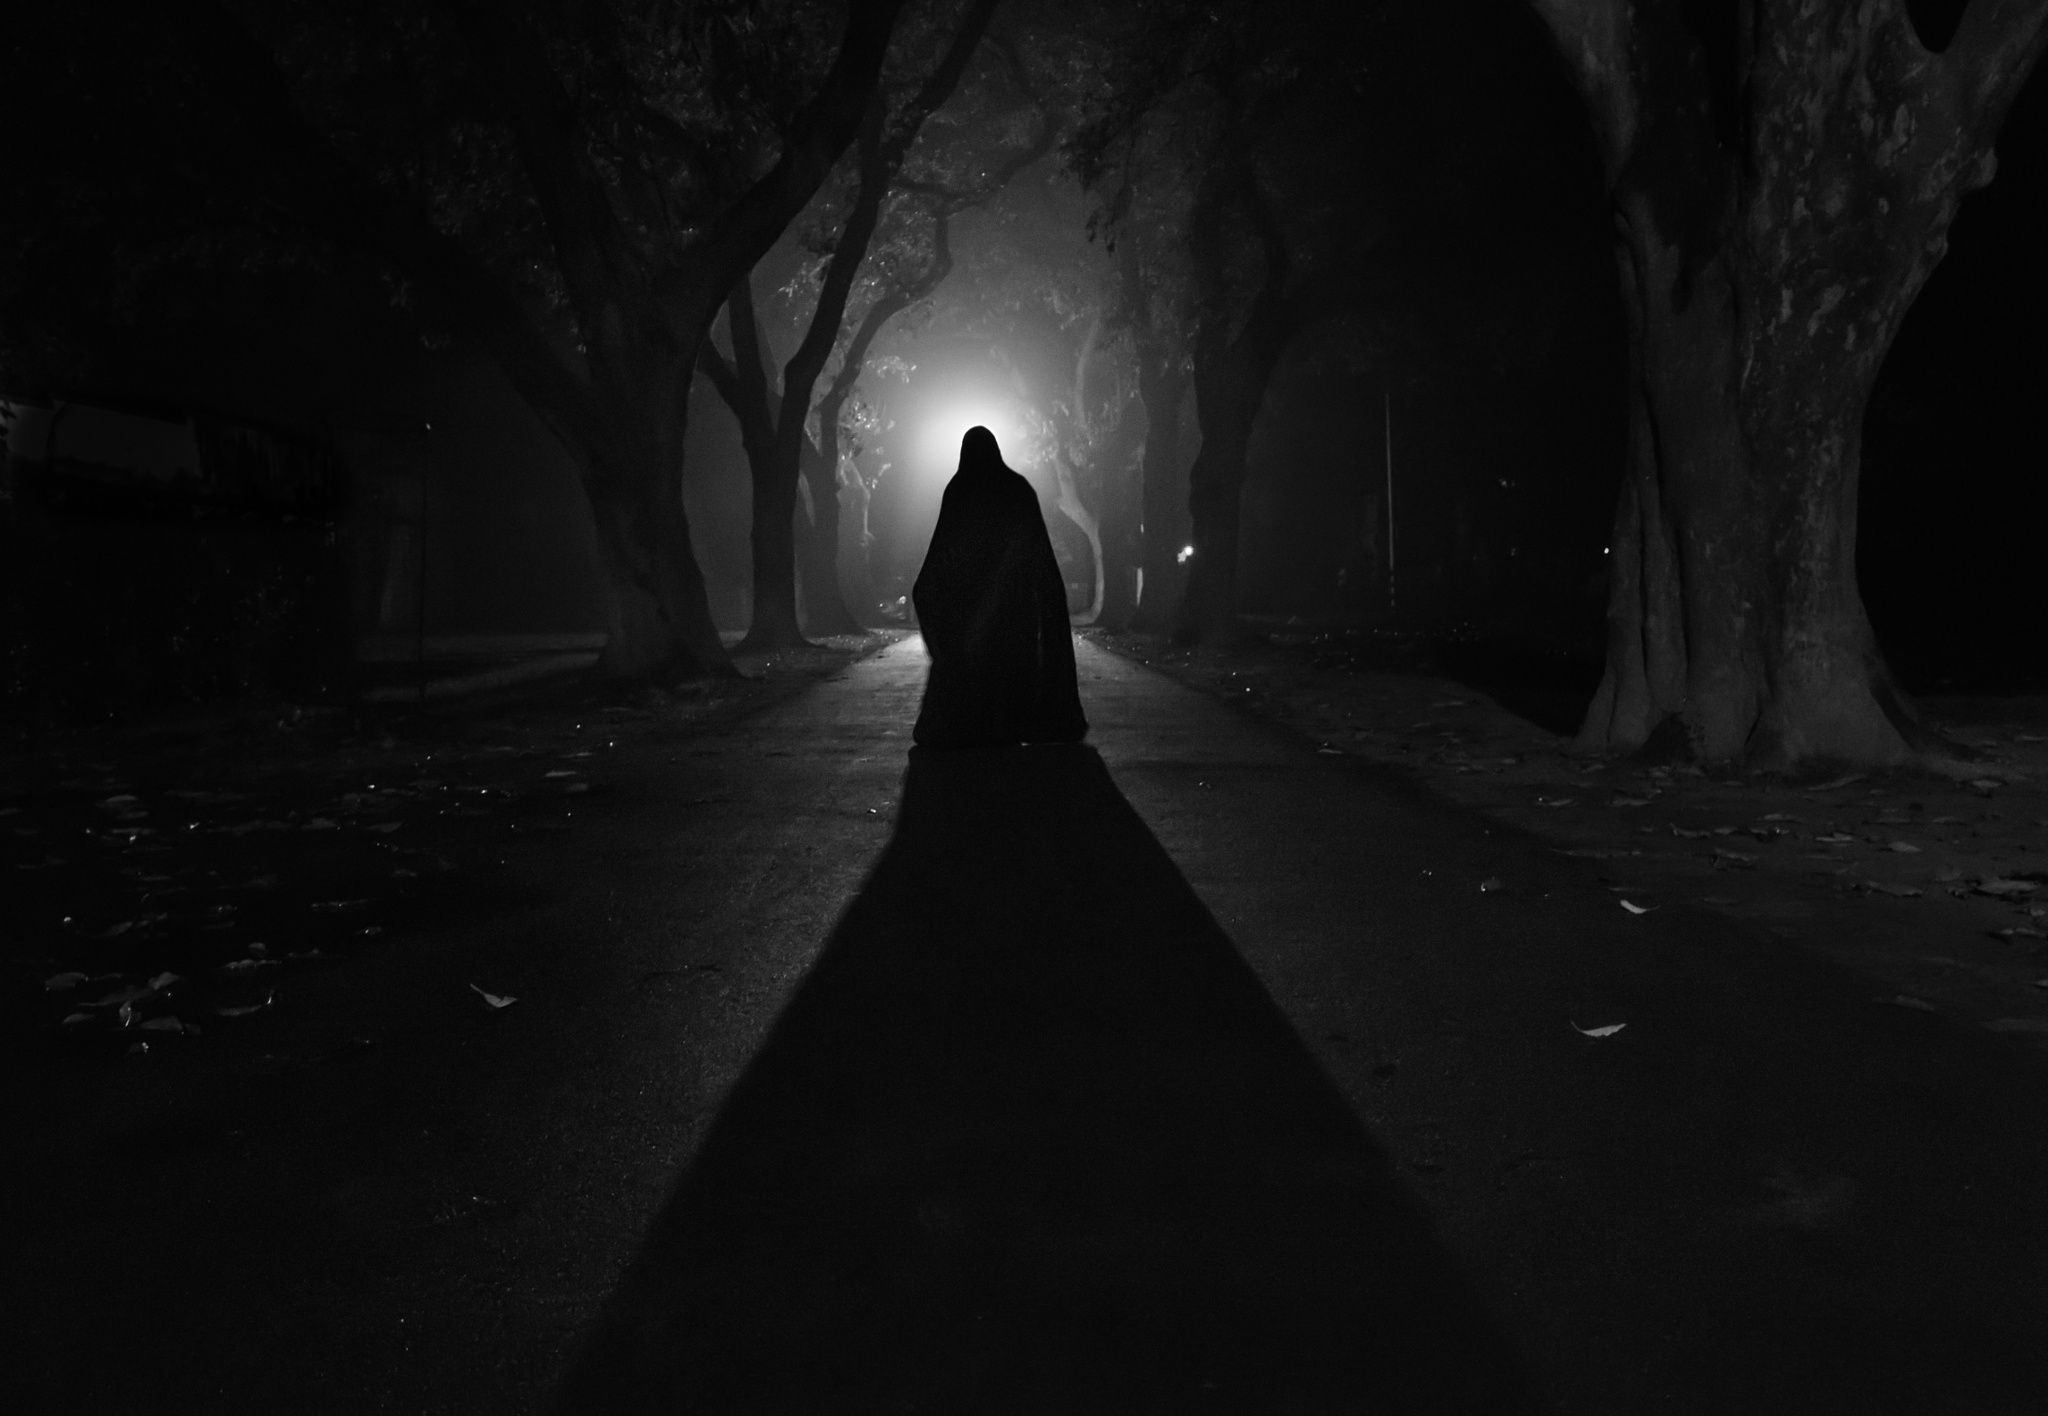 shadow fallowing.. by sayed wasi haider